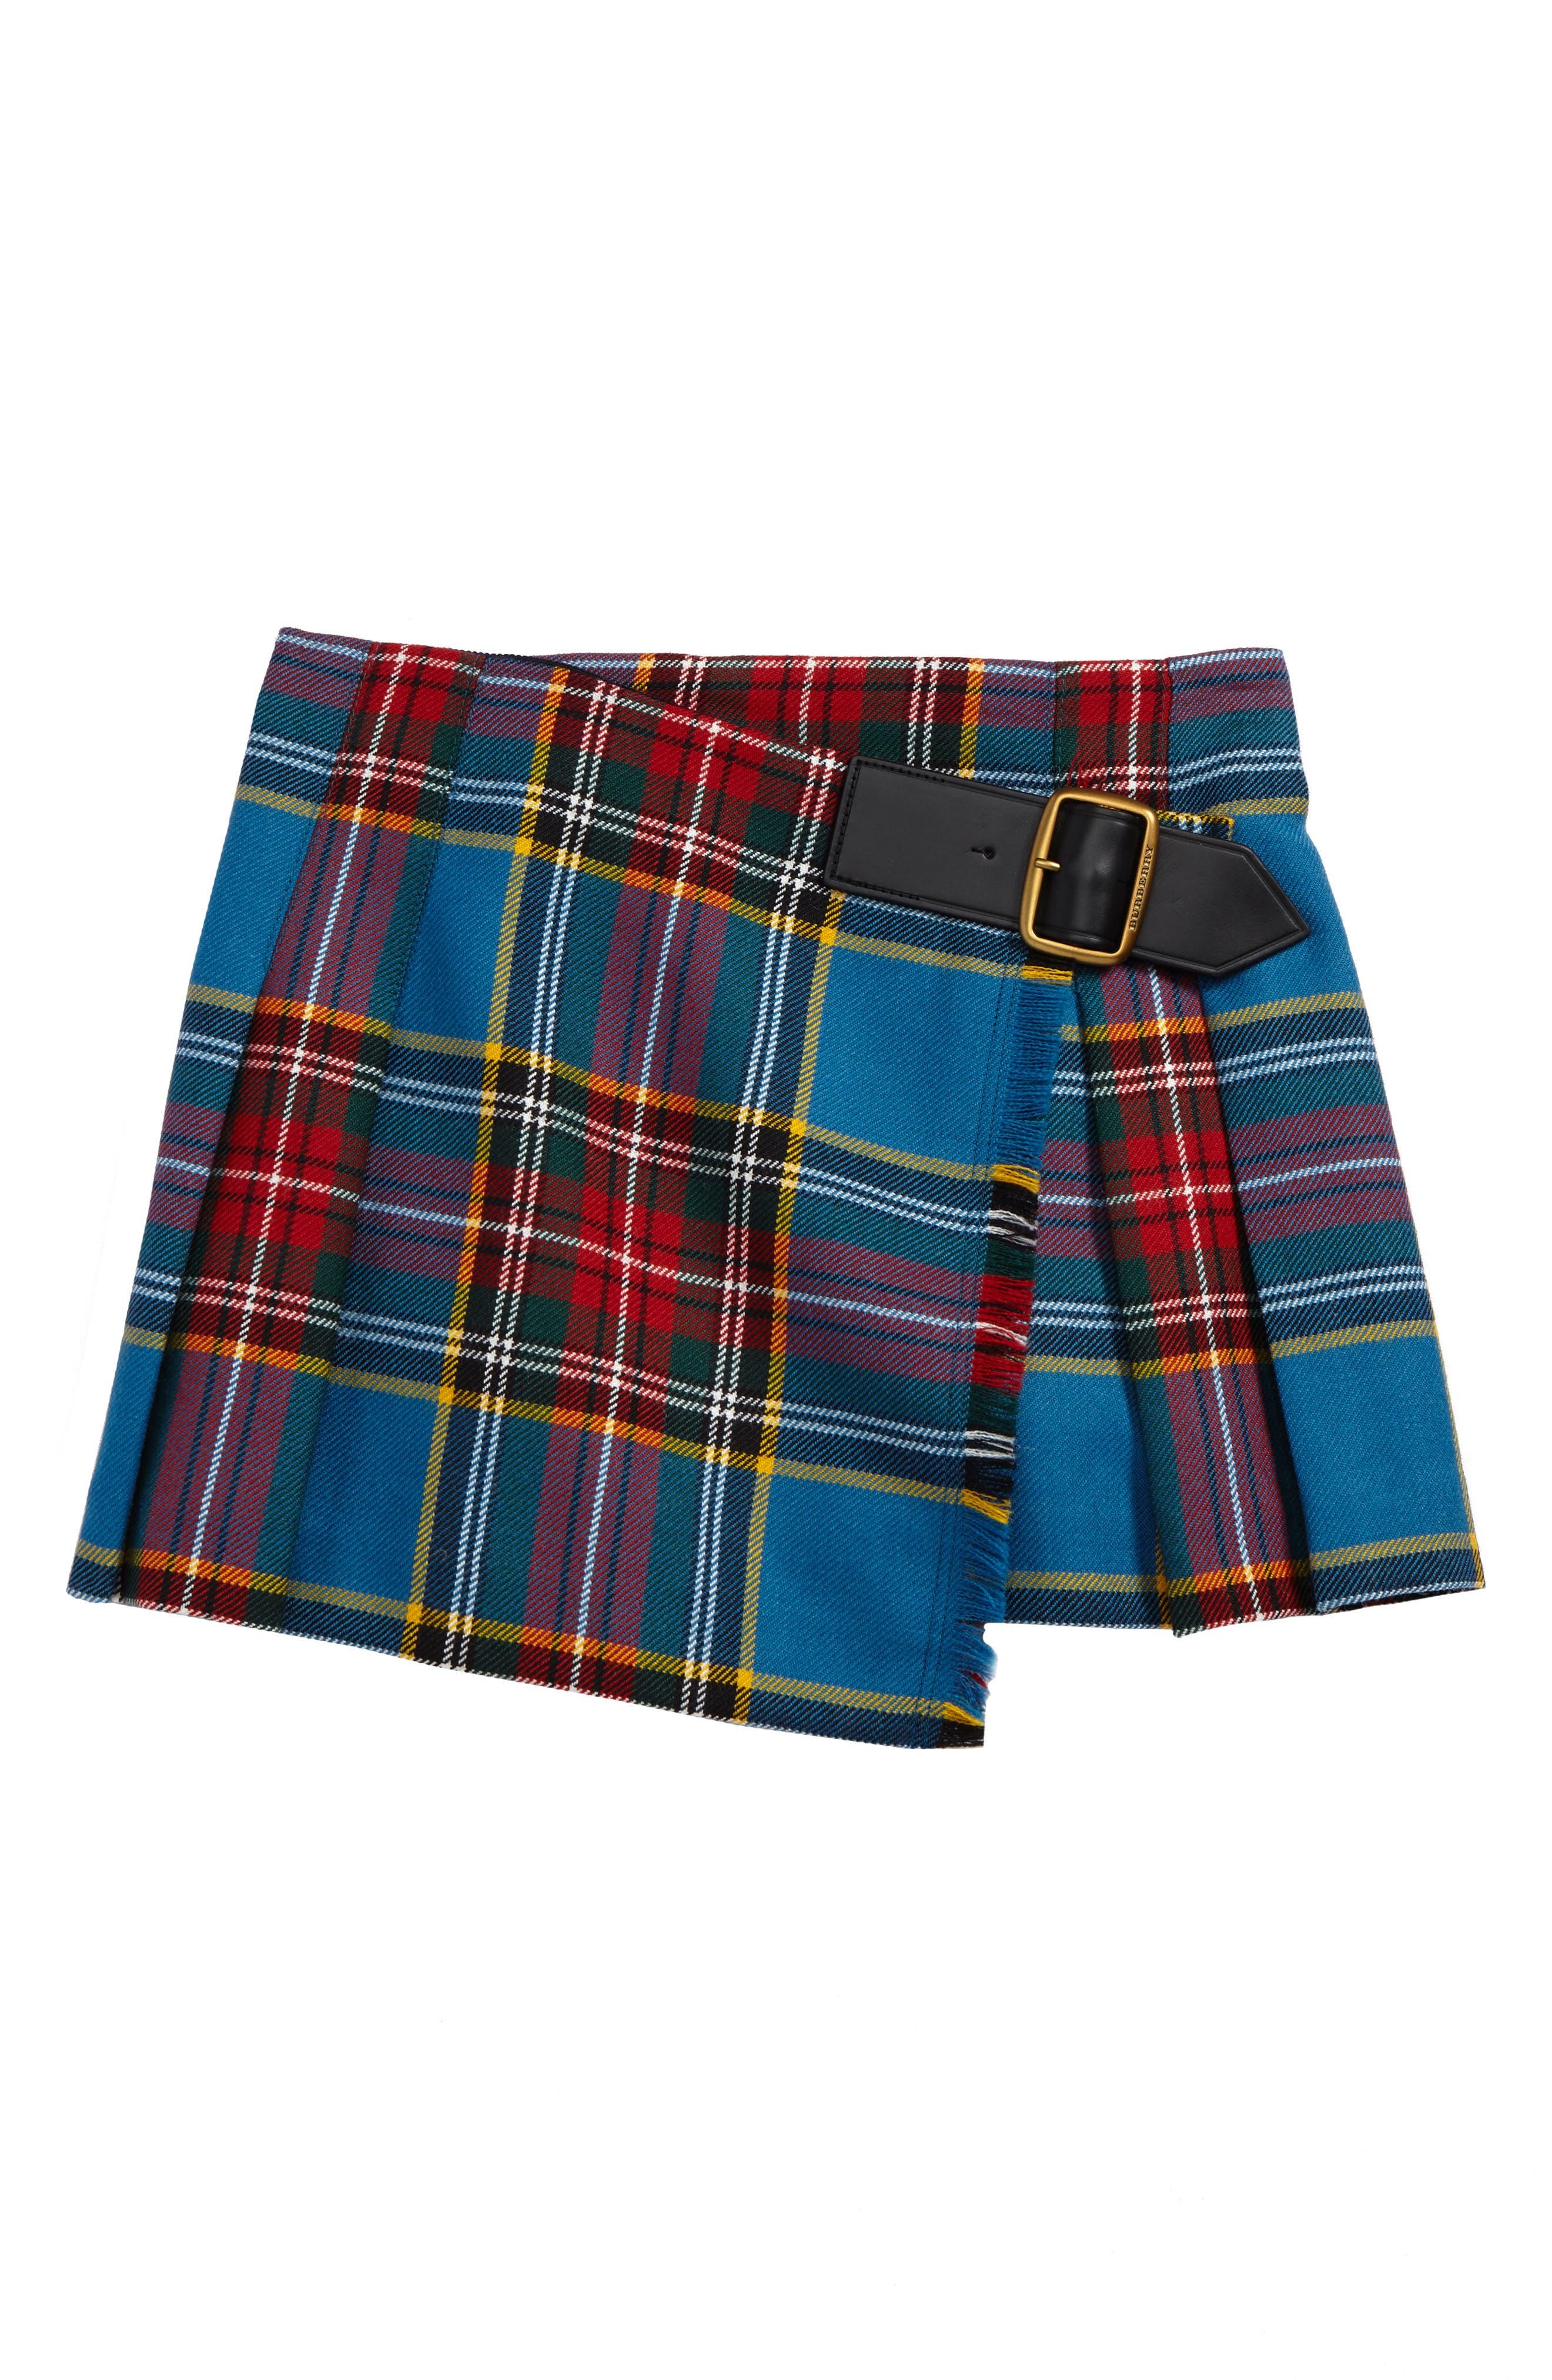 Klorrie Plaid Wool Miniskirt,                             Main thumbnail 1, color,                             Cyan Blue